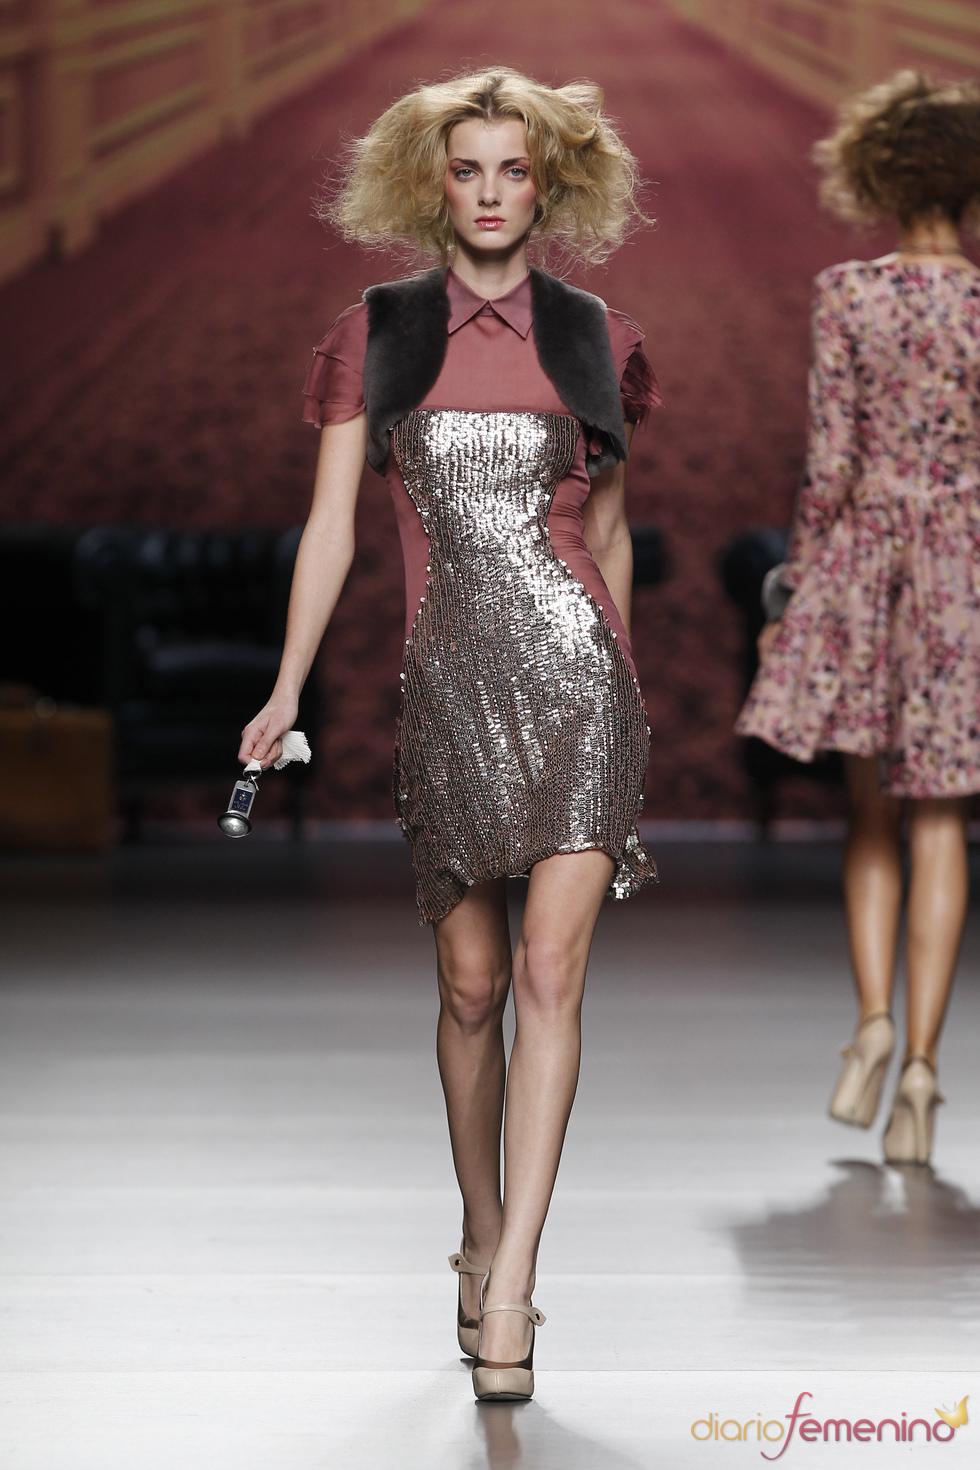 Vestido plateado. Alma Aguilar. Cibeles Madrid Fashion Week 2011